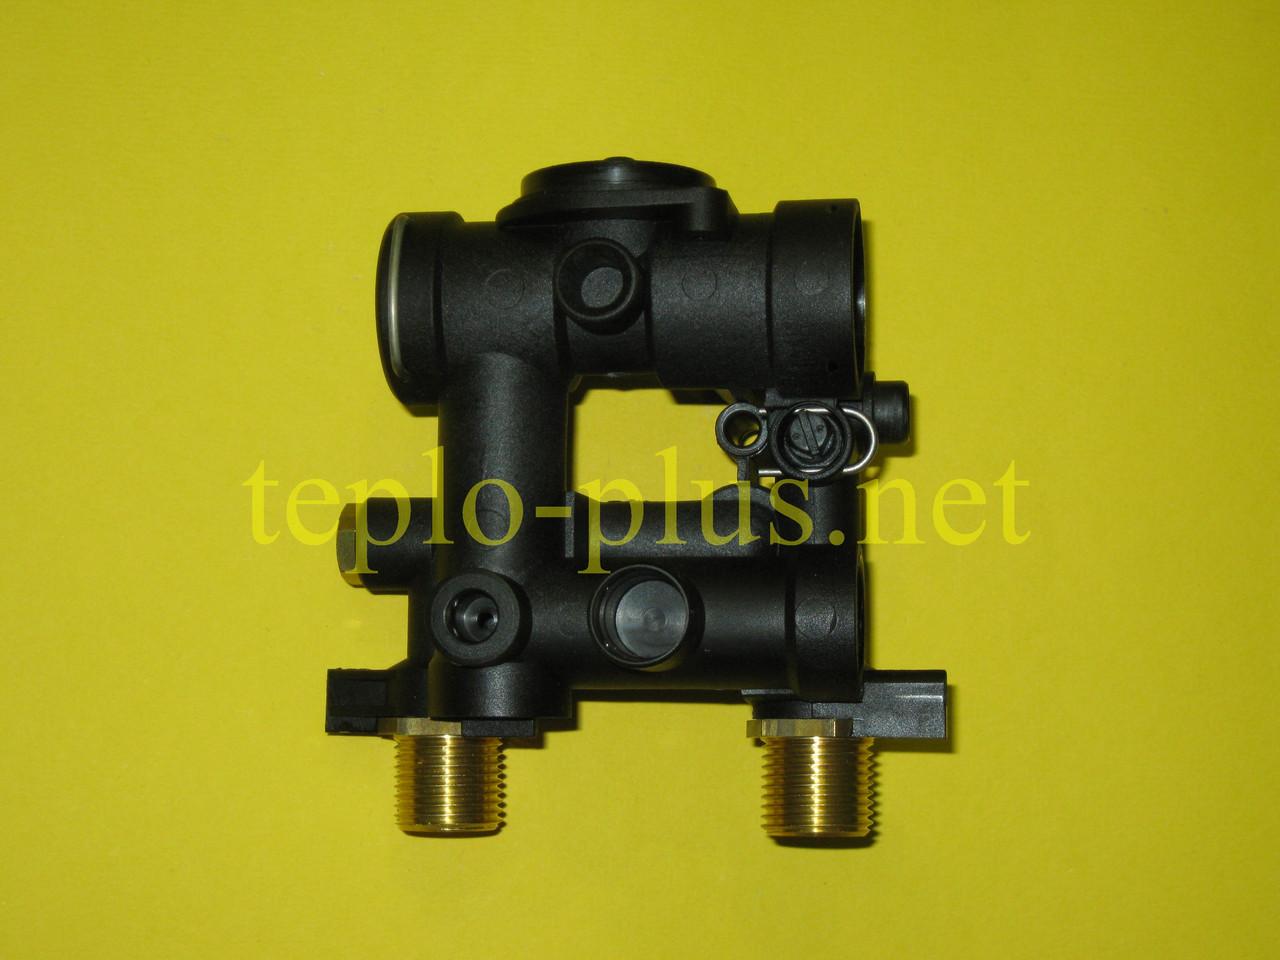 Корпус (пластиковая часть) клапана трехходового Sime Format.Zip BF TS, Format.Zip 5 25 BF TS